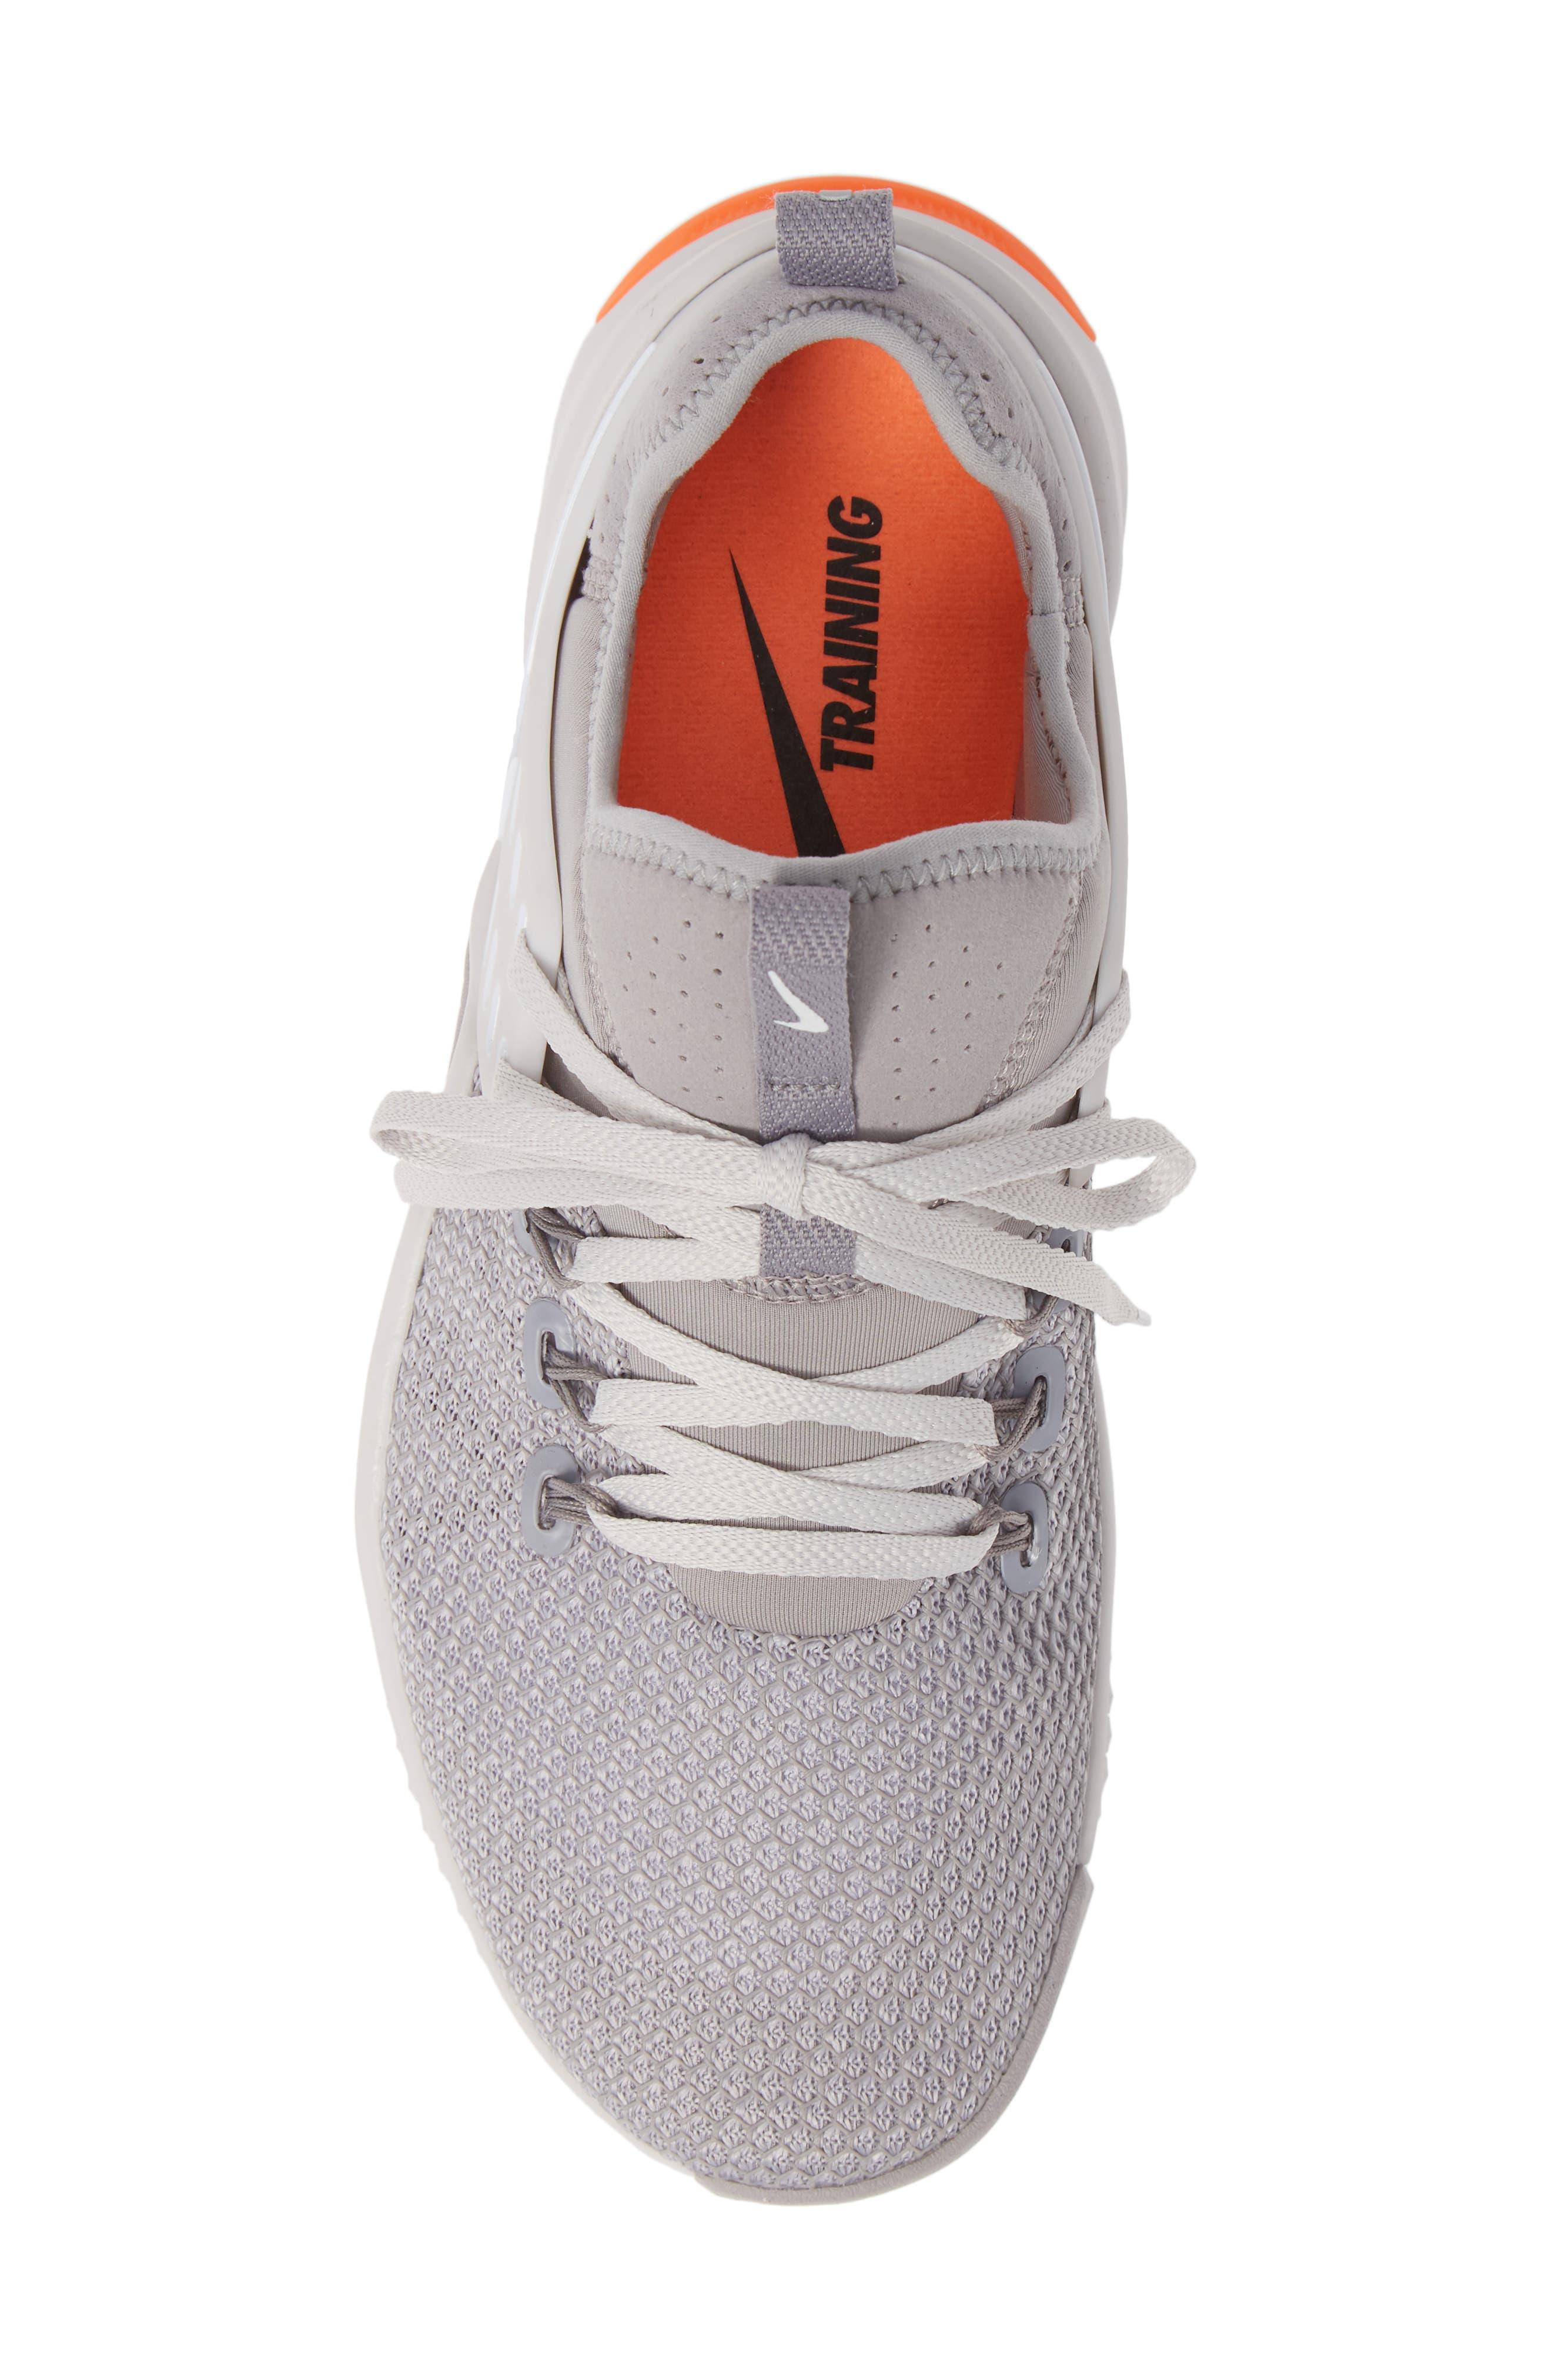 Free x Metcon Training Shoe,                             Alternate thumbnail 5, color,                             GREY/ WHITE/ CRIMSON